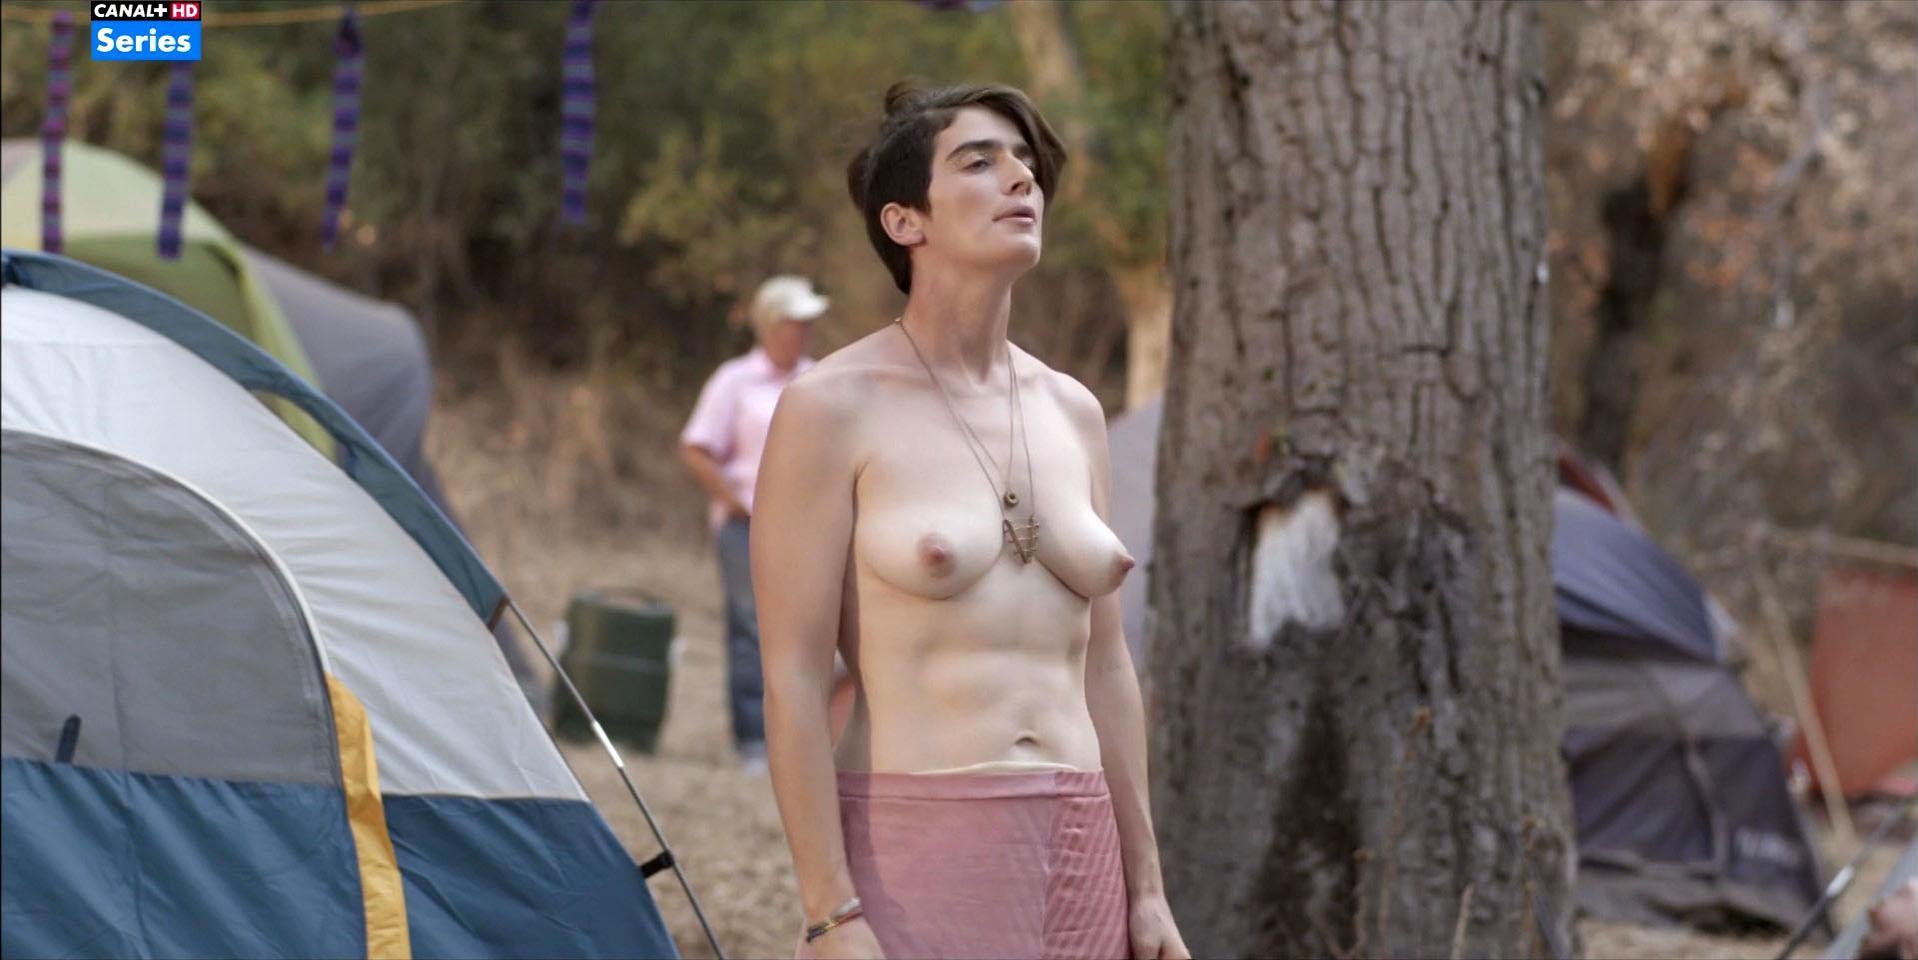 Gaby Hoffmann nude - Transparent s02e09 (2015)